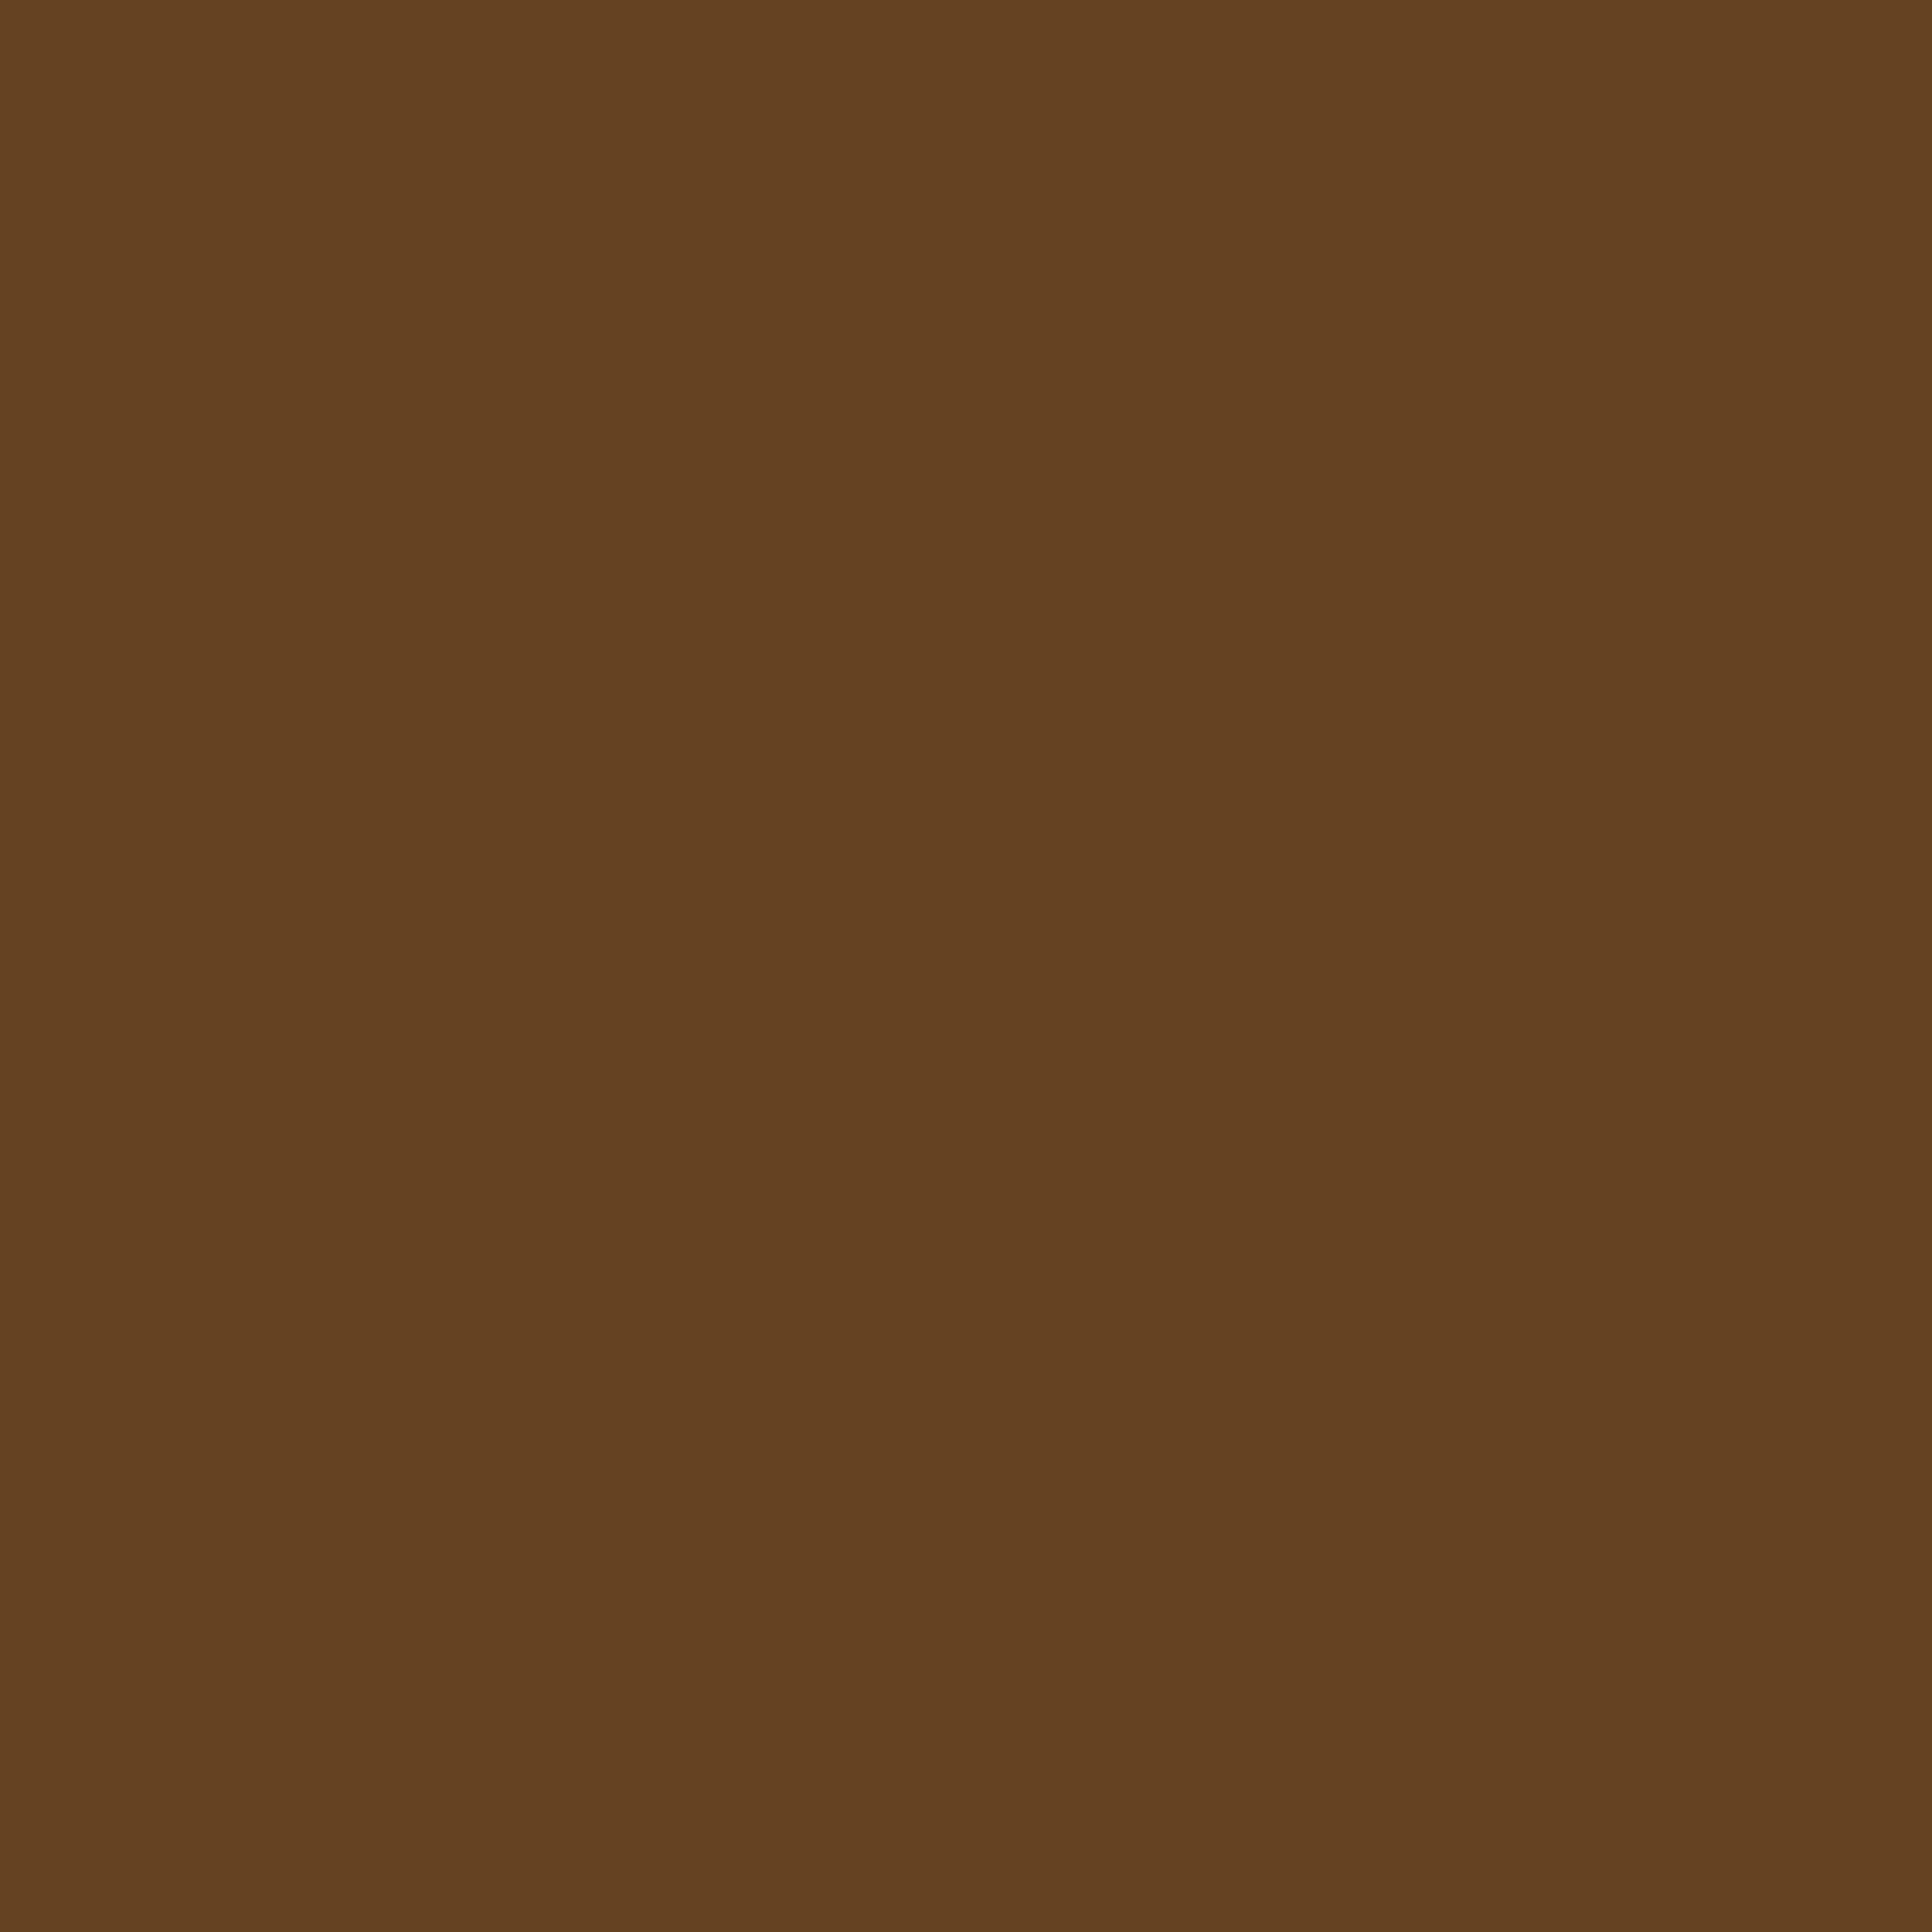 X Dark Brown Solid Color Background